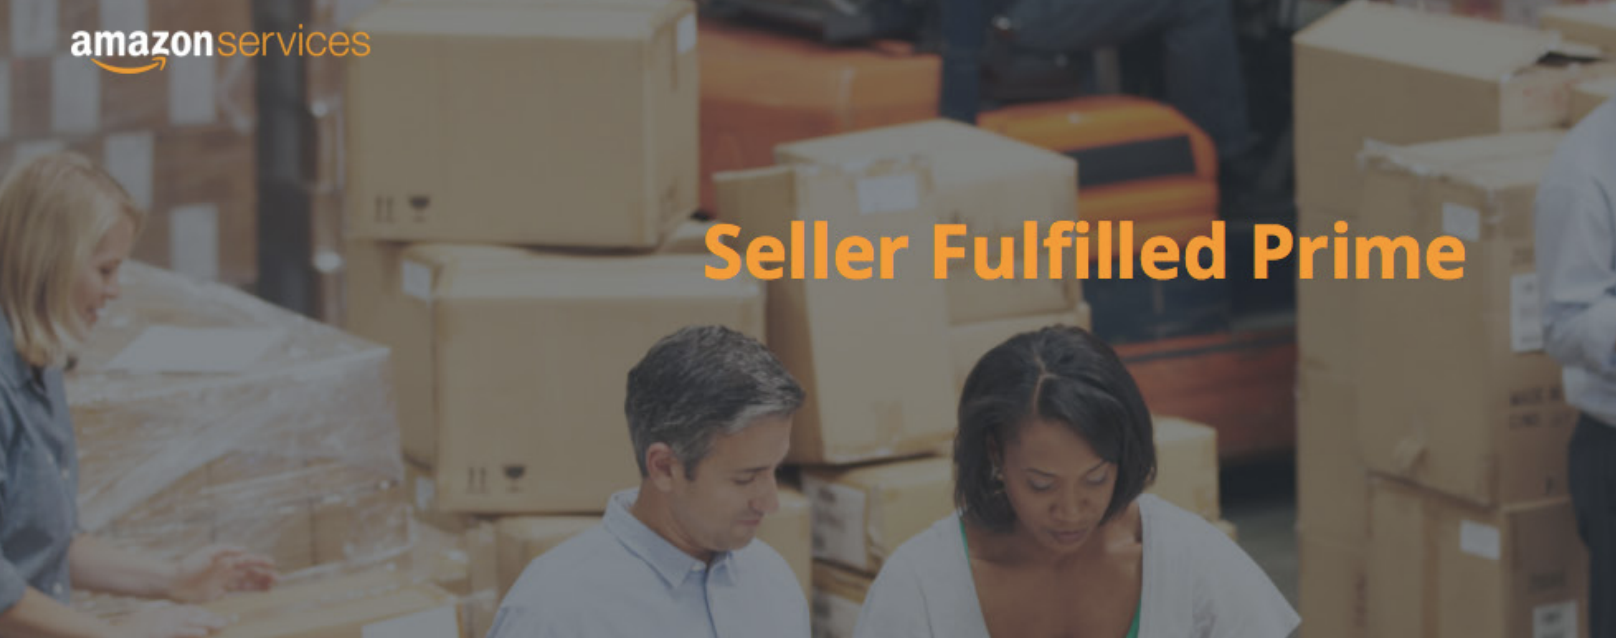 Amazon SFP logo